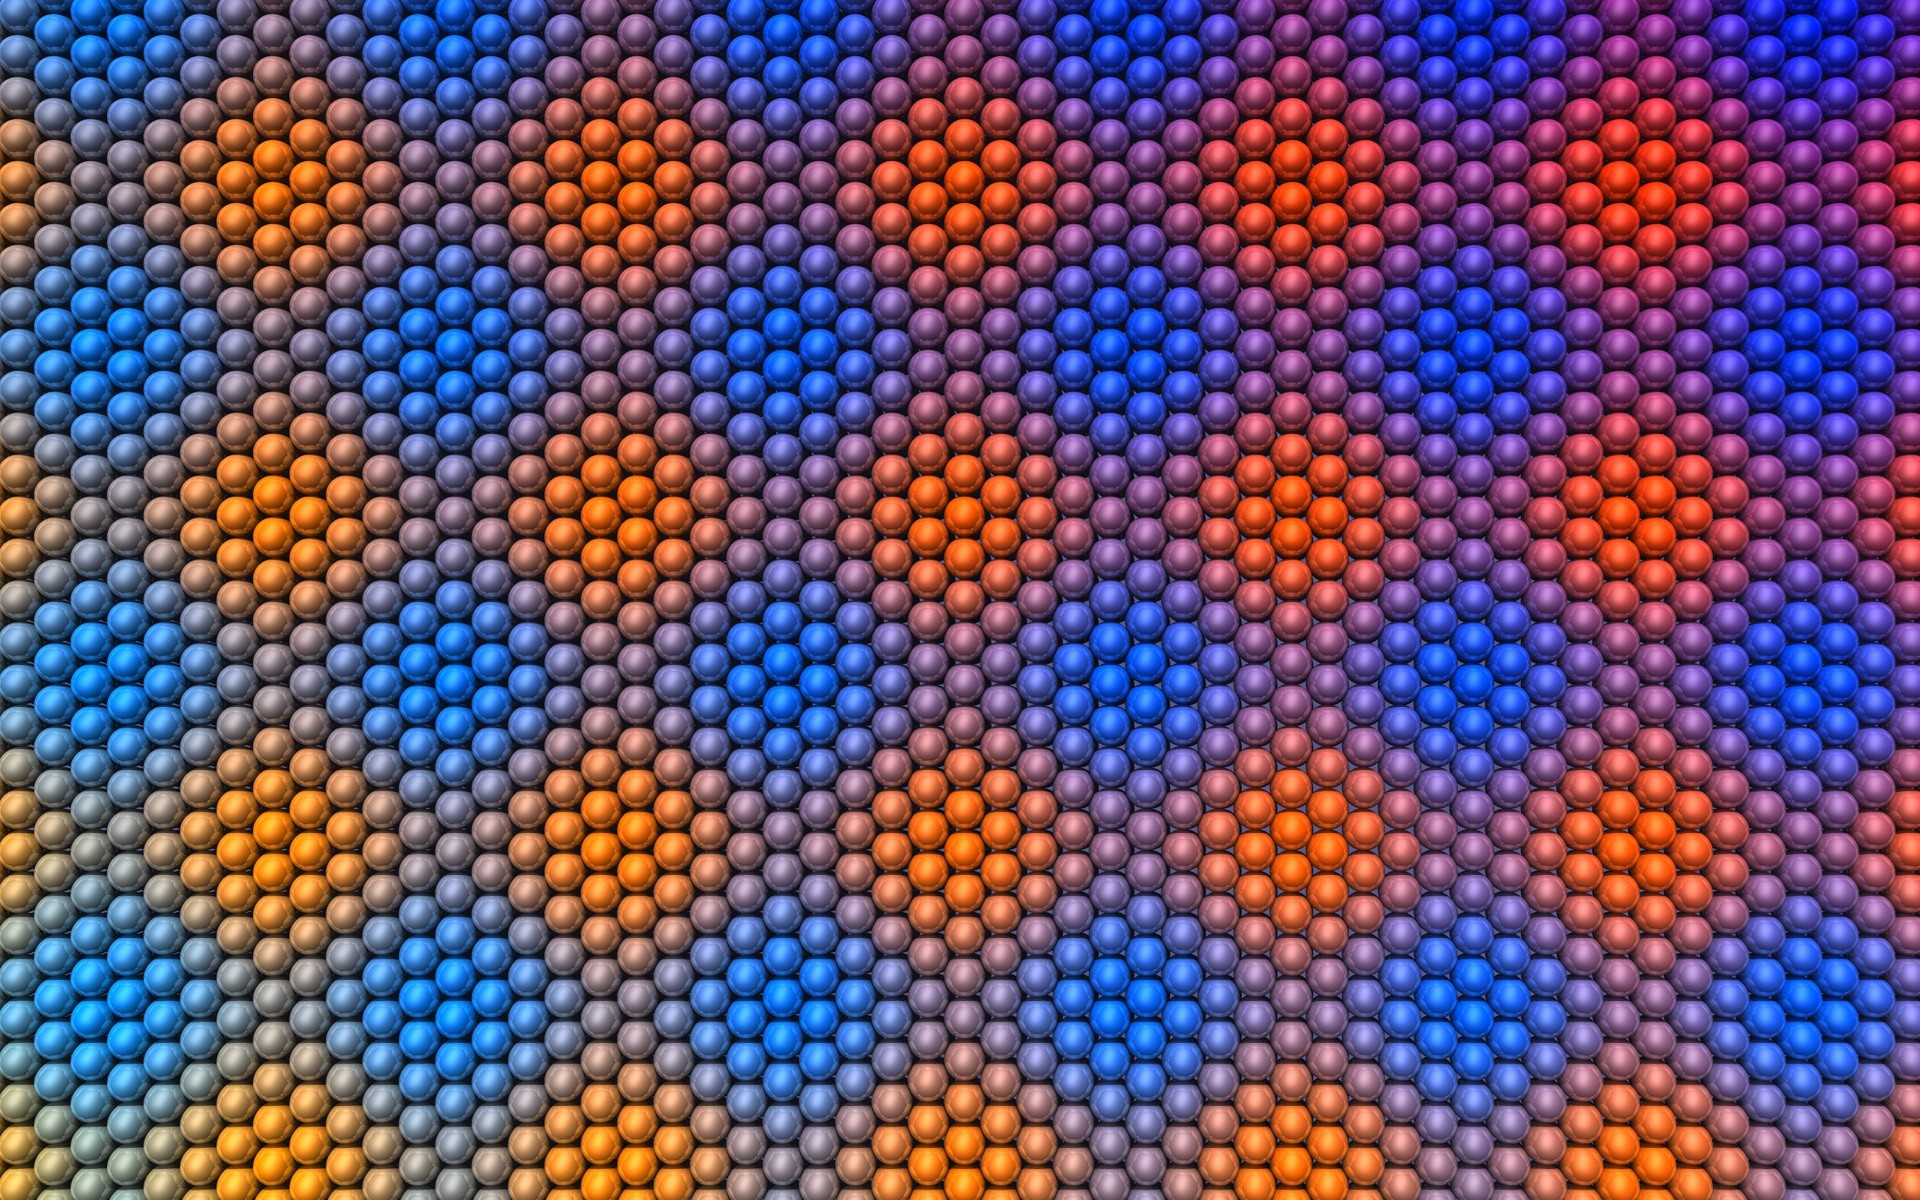 Abstract Color Desktop Wallpaper 60567